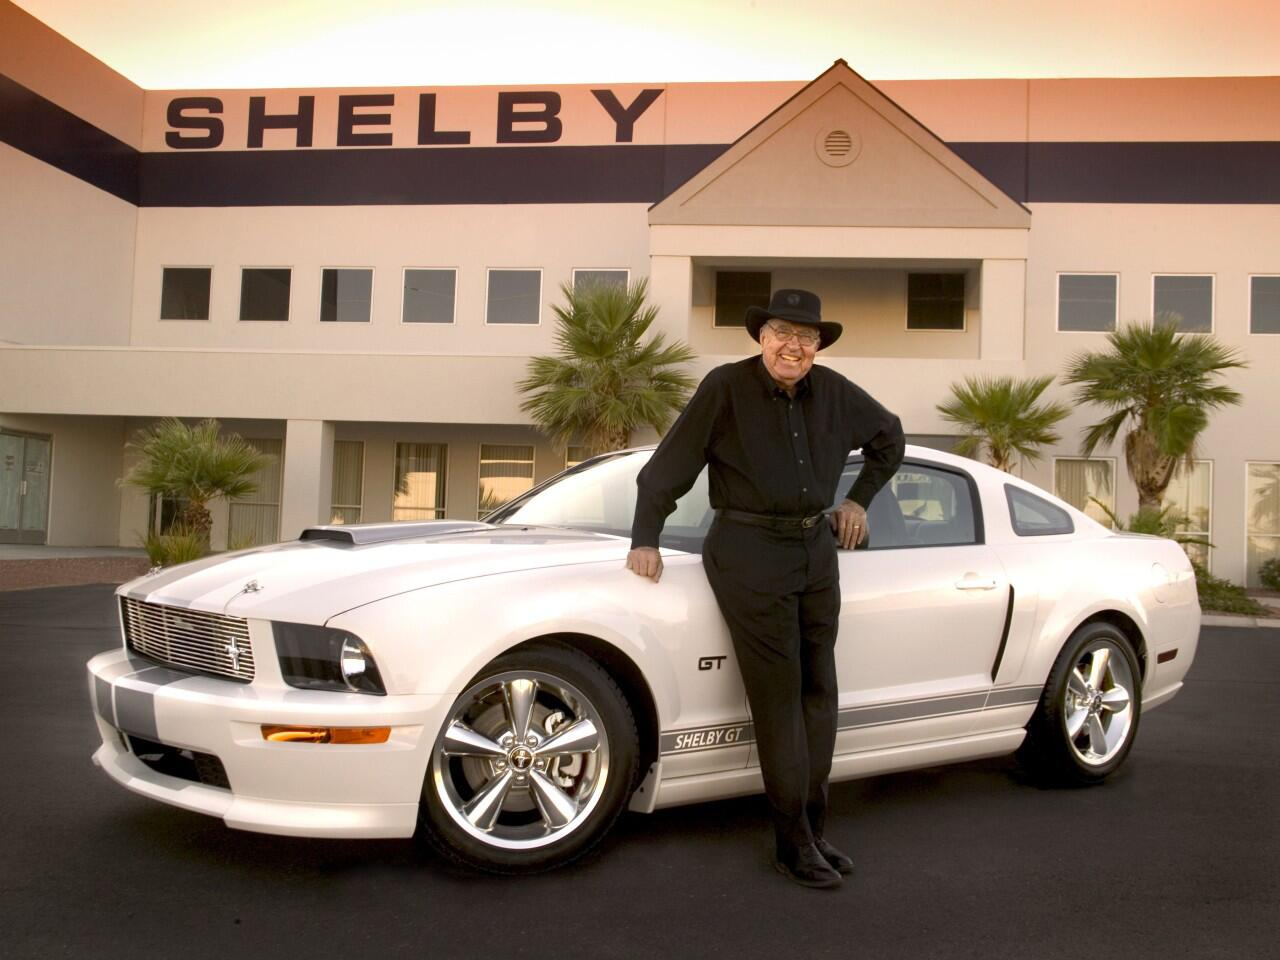 Bild zu Carroll Shelby mit Ford Mustang Shelby GT